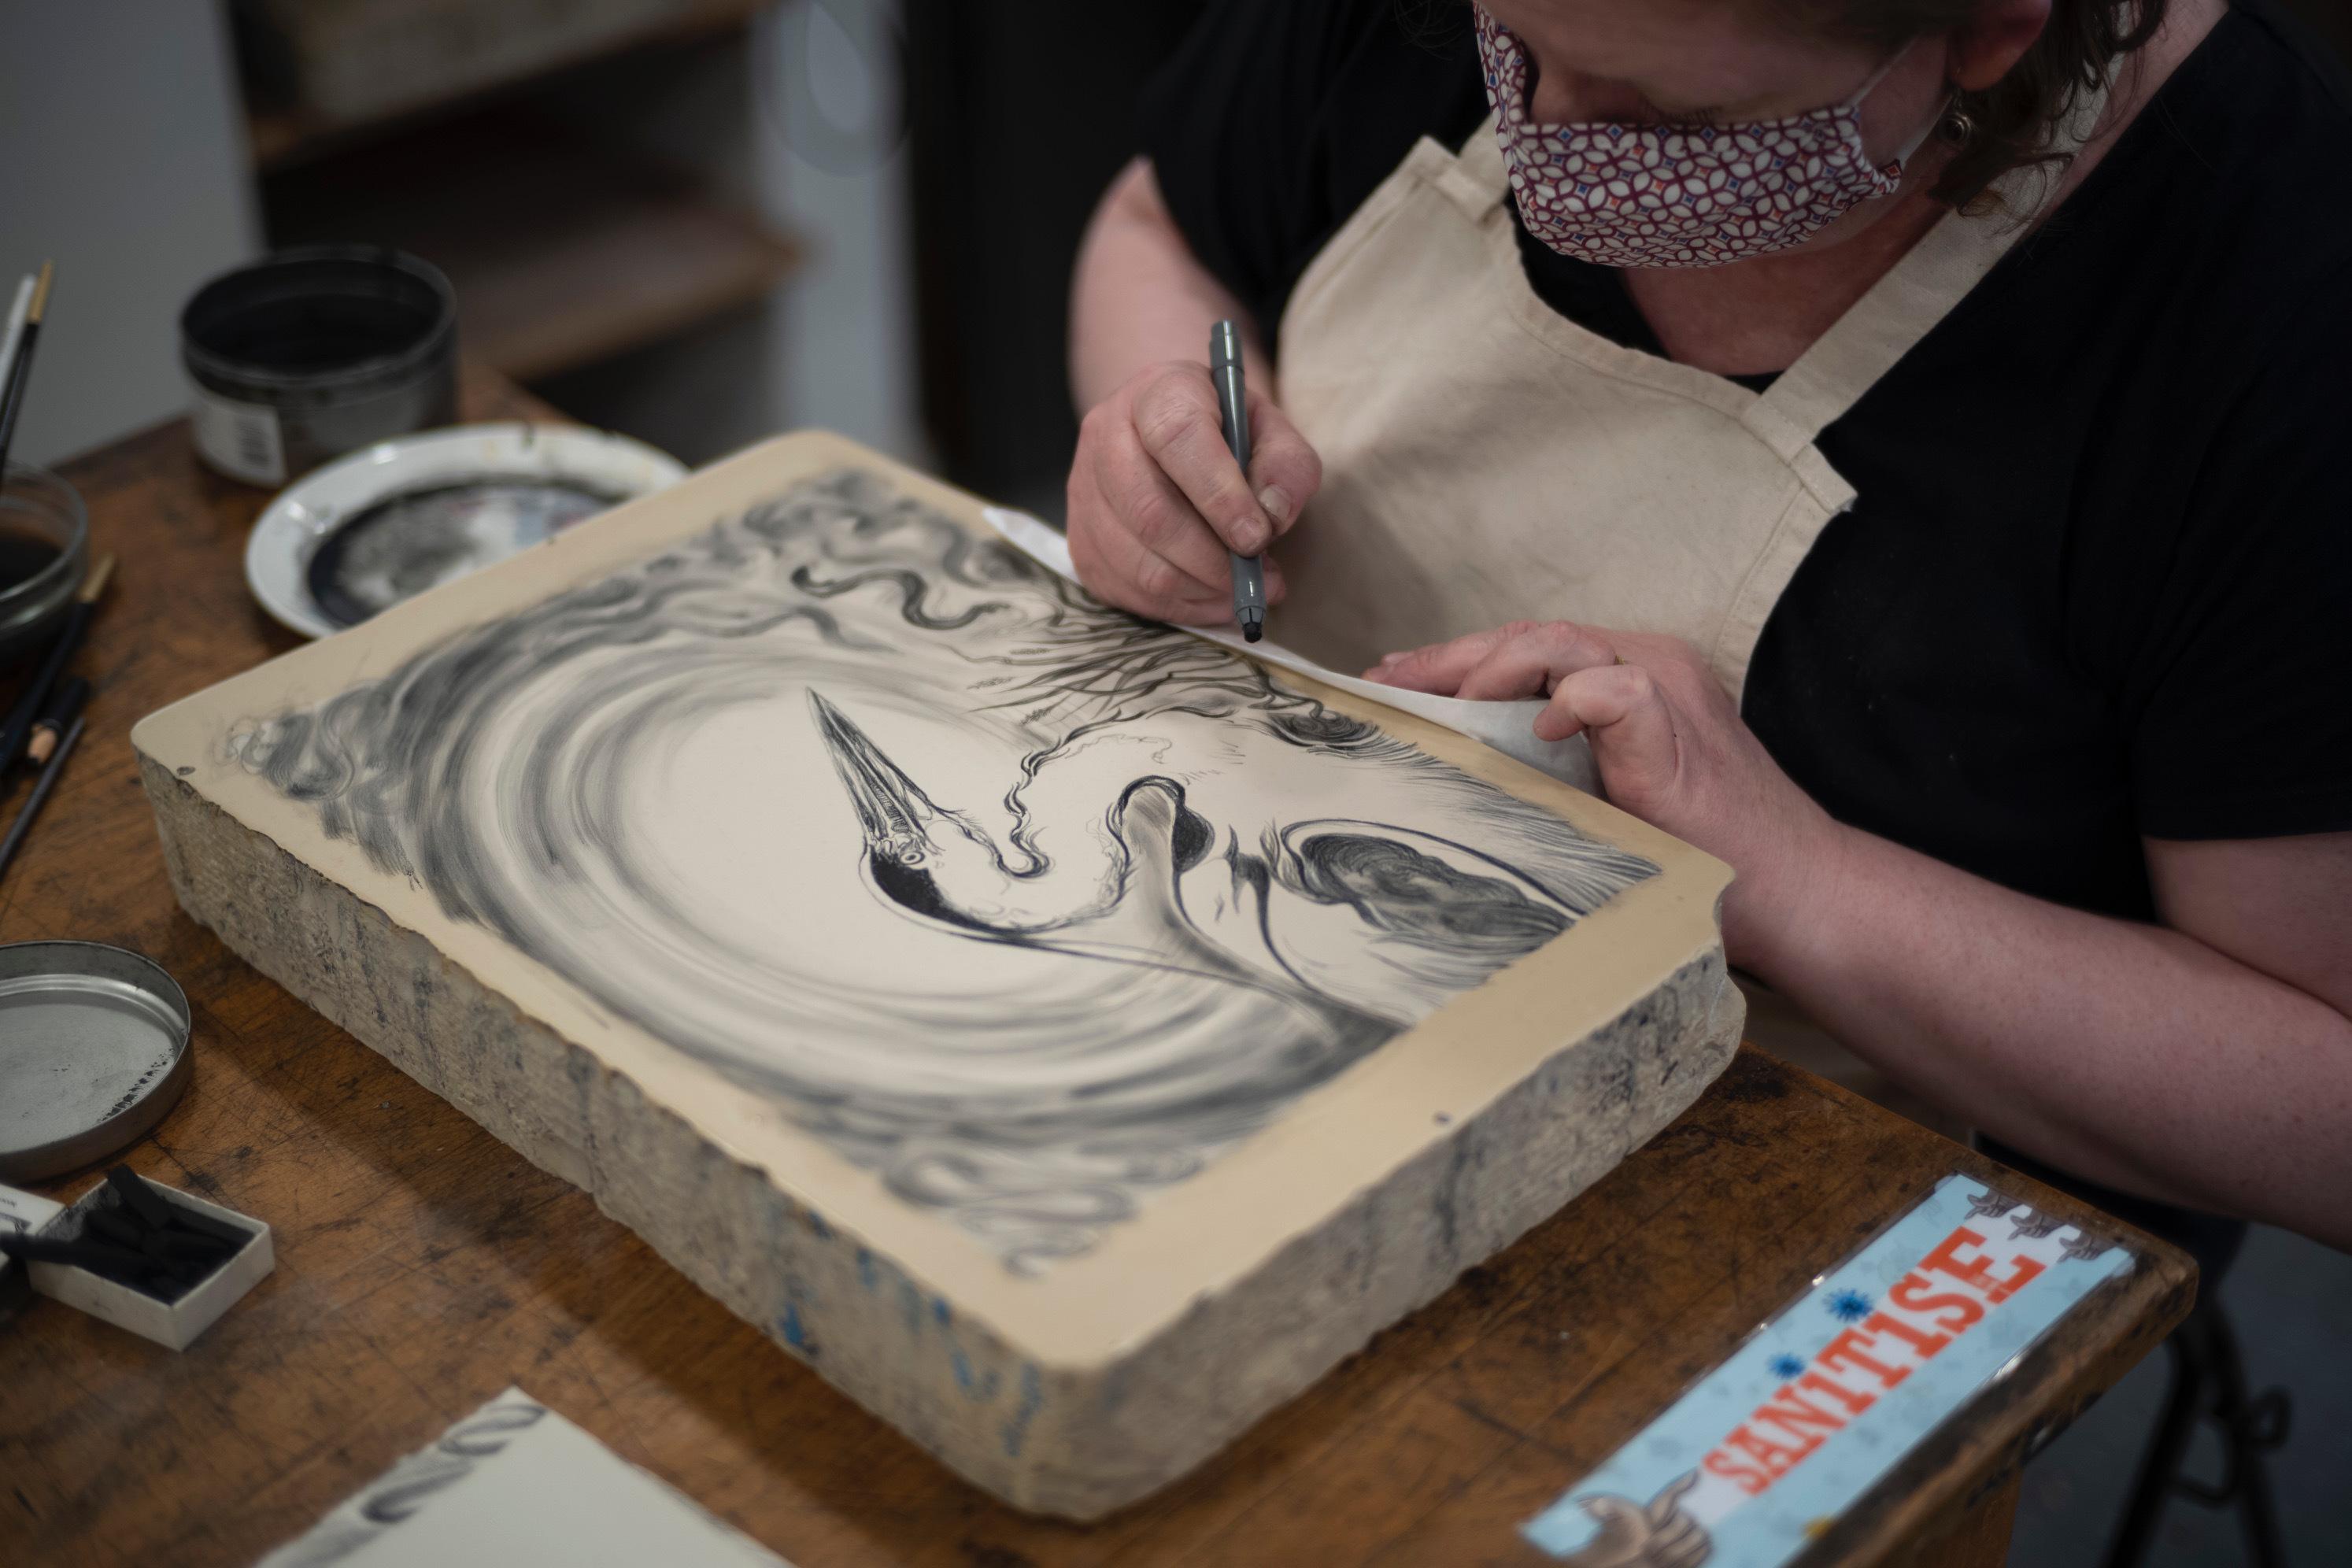 Georgina Coburn drawing on a lithographic printing stone